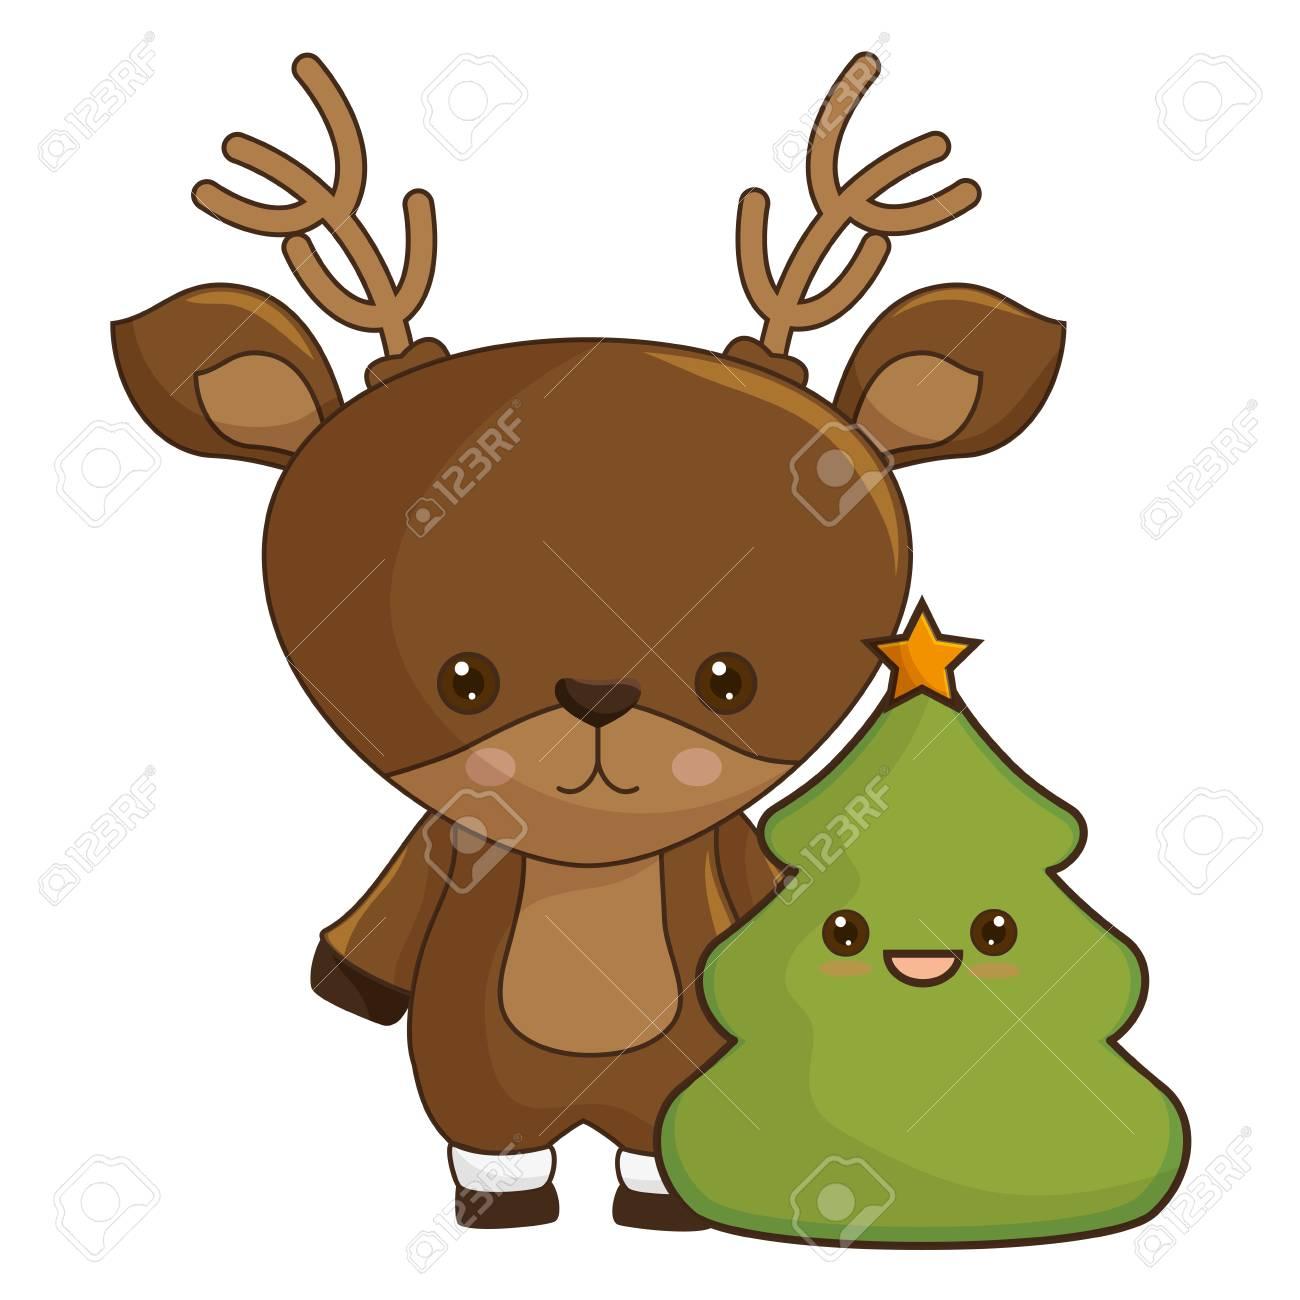 Joyeux Noël Renne Kawaii Personnage Vector Illustration Design Clip